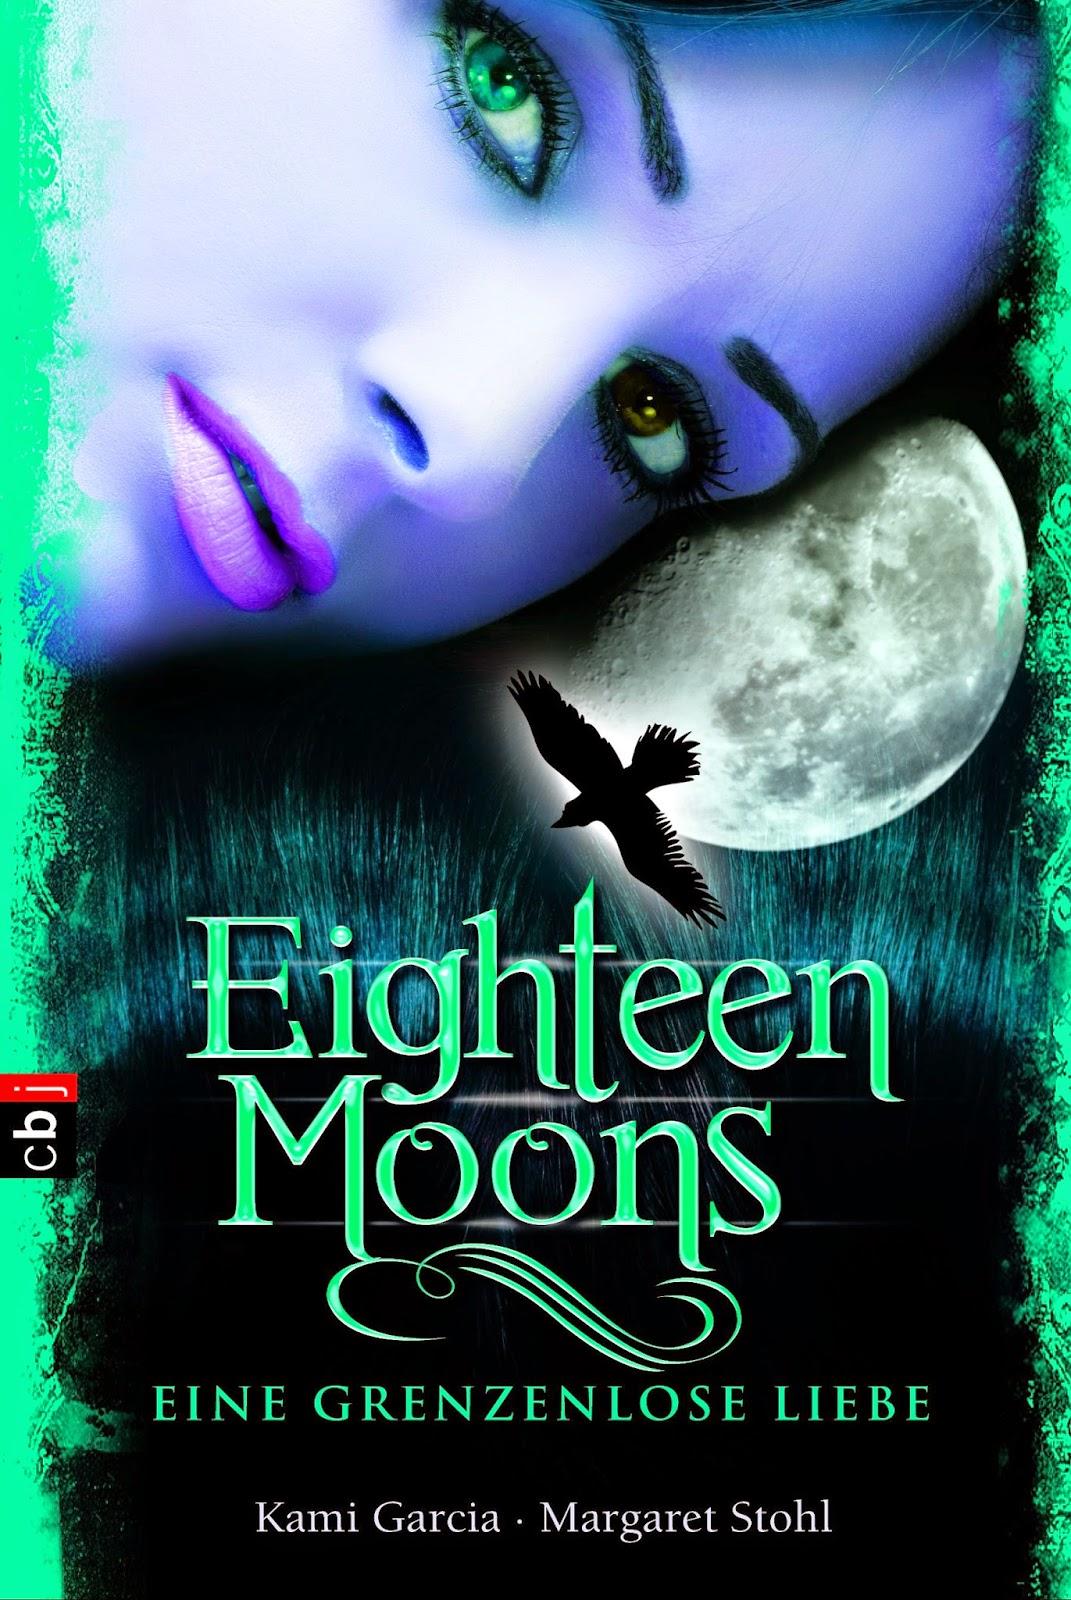 http://www.amazon.de/Eighteen-Moons-Eine-grenzenlose-Liebe/dp/3570154726/ref=sr_1_1_bnp_1_har?ie=UTF8&qid=1399123473&sr=8-1&keywords=eighteen+moons